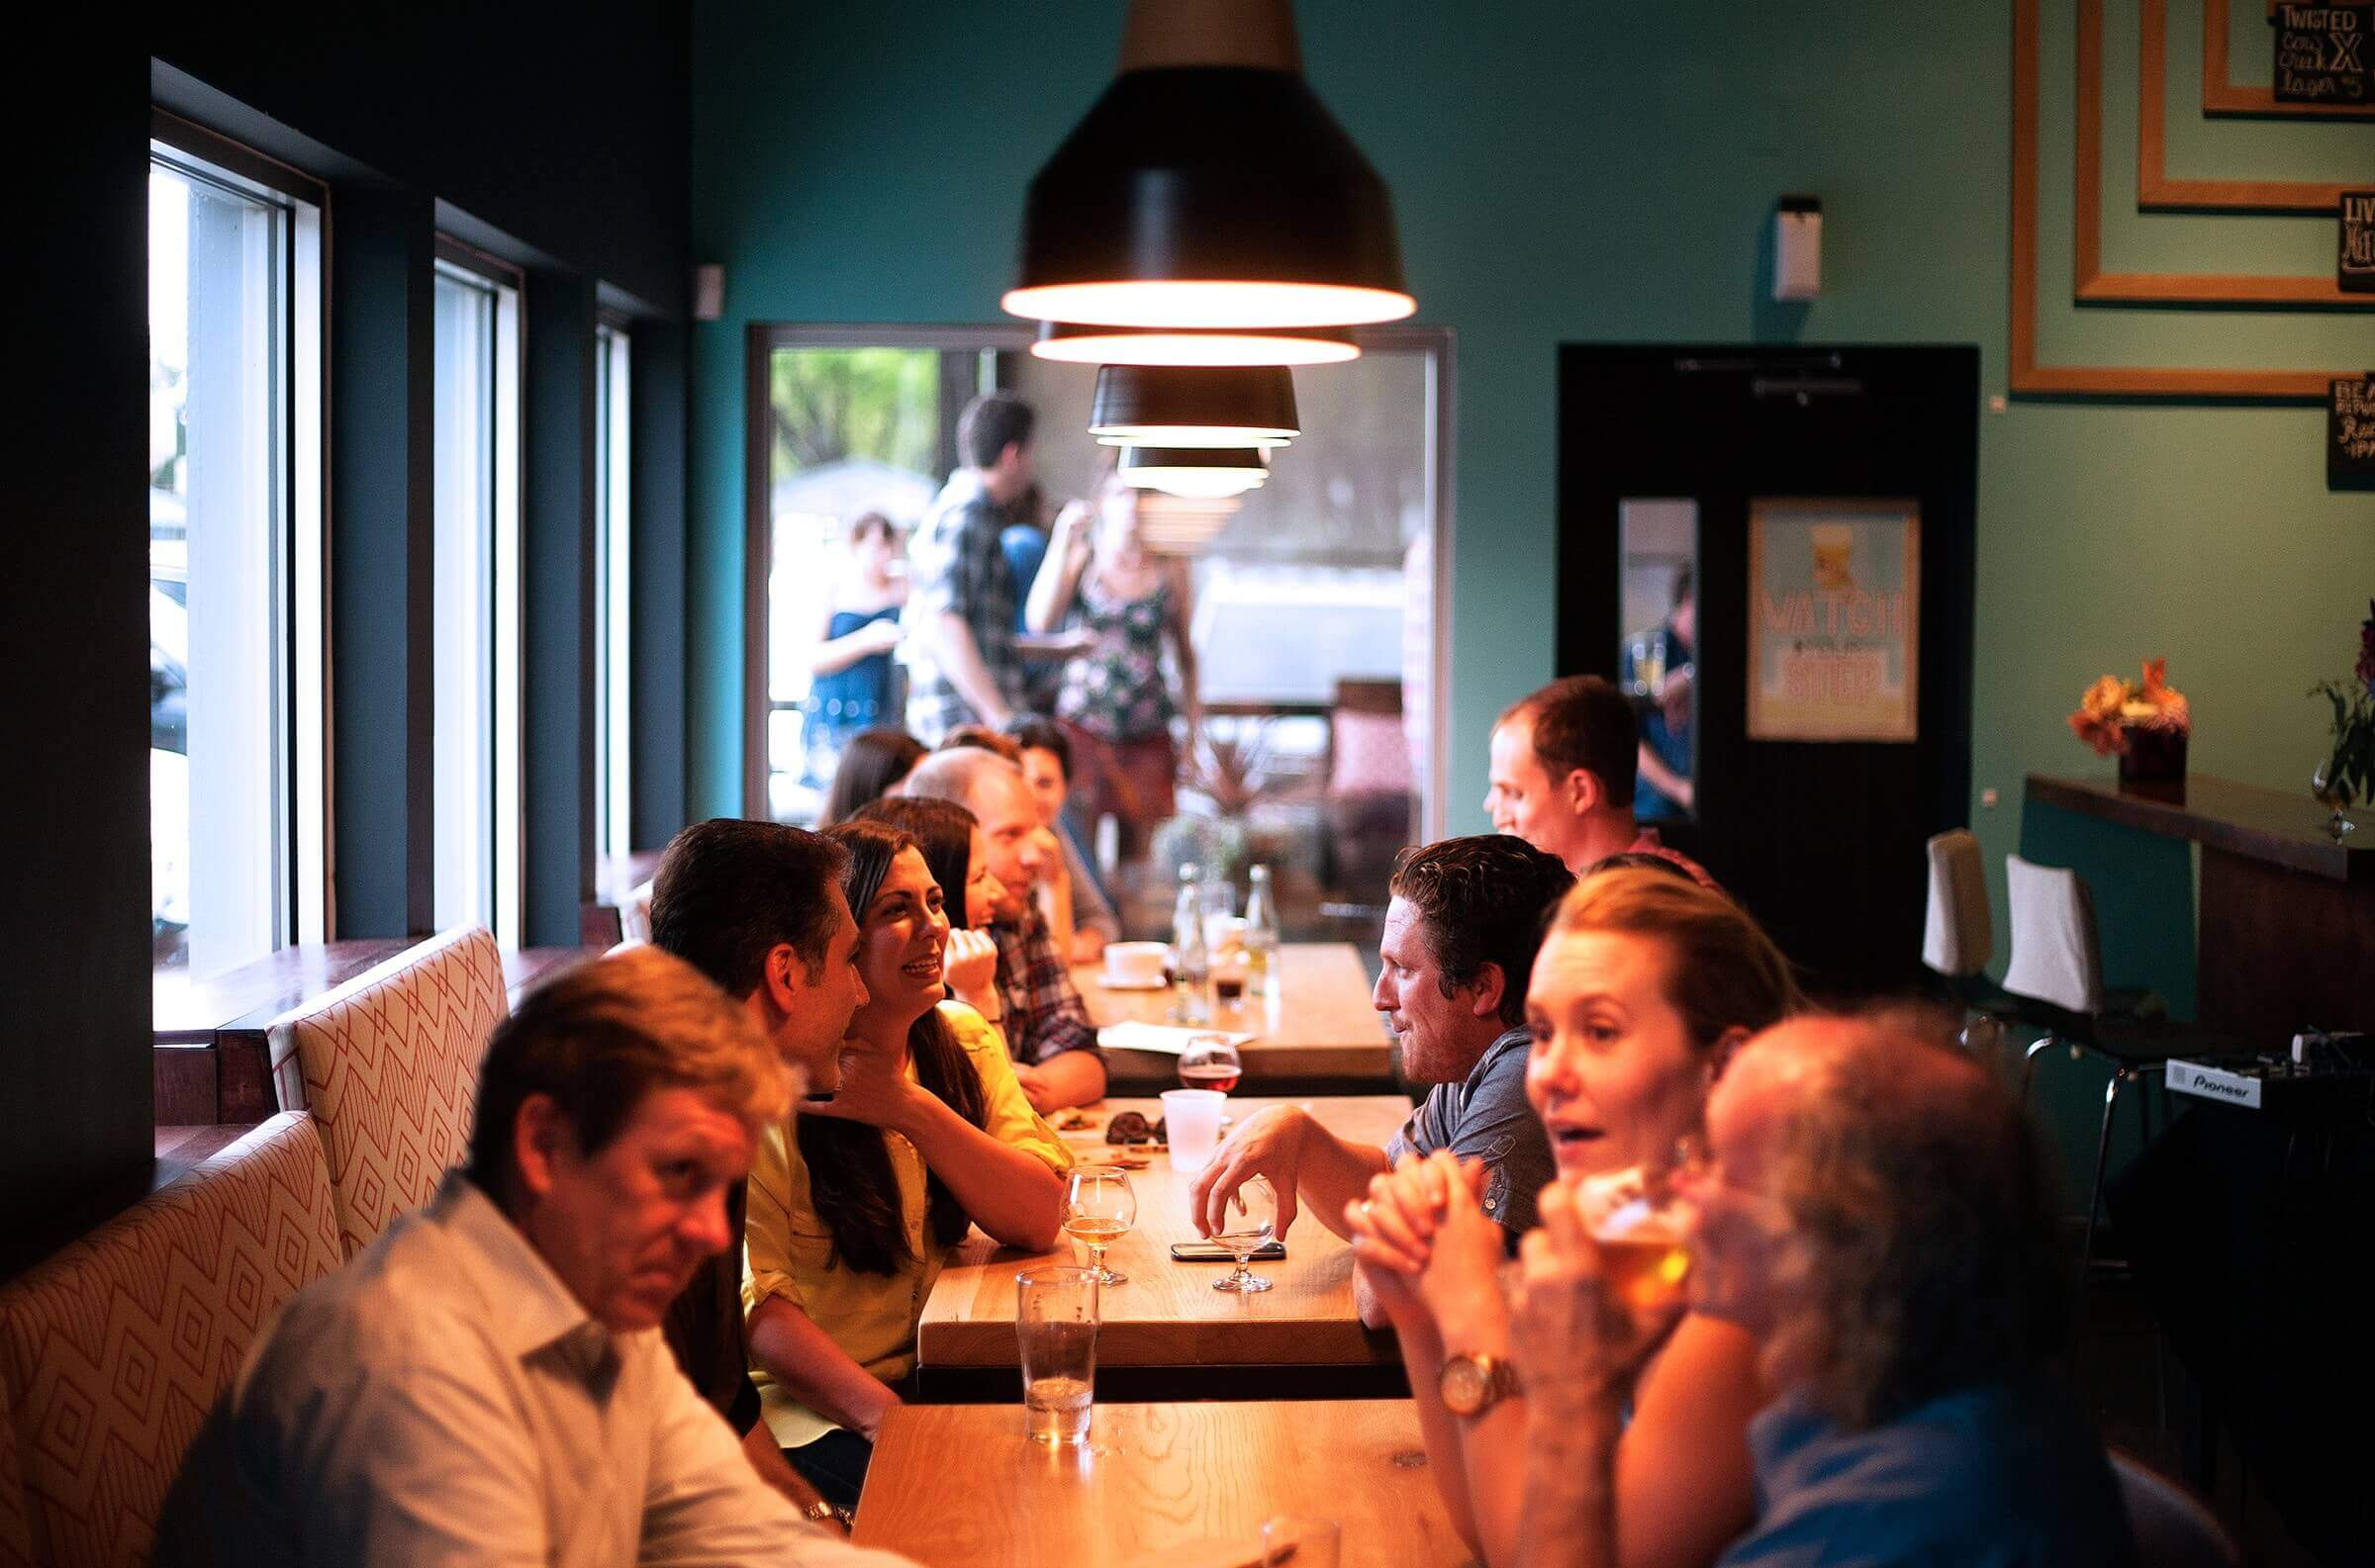 People talking in a restaurant.